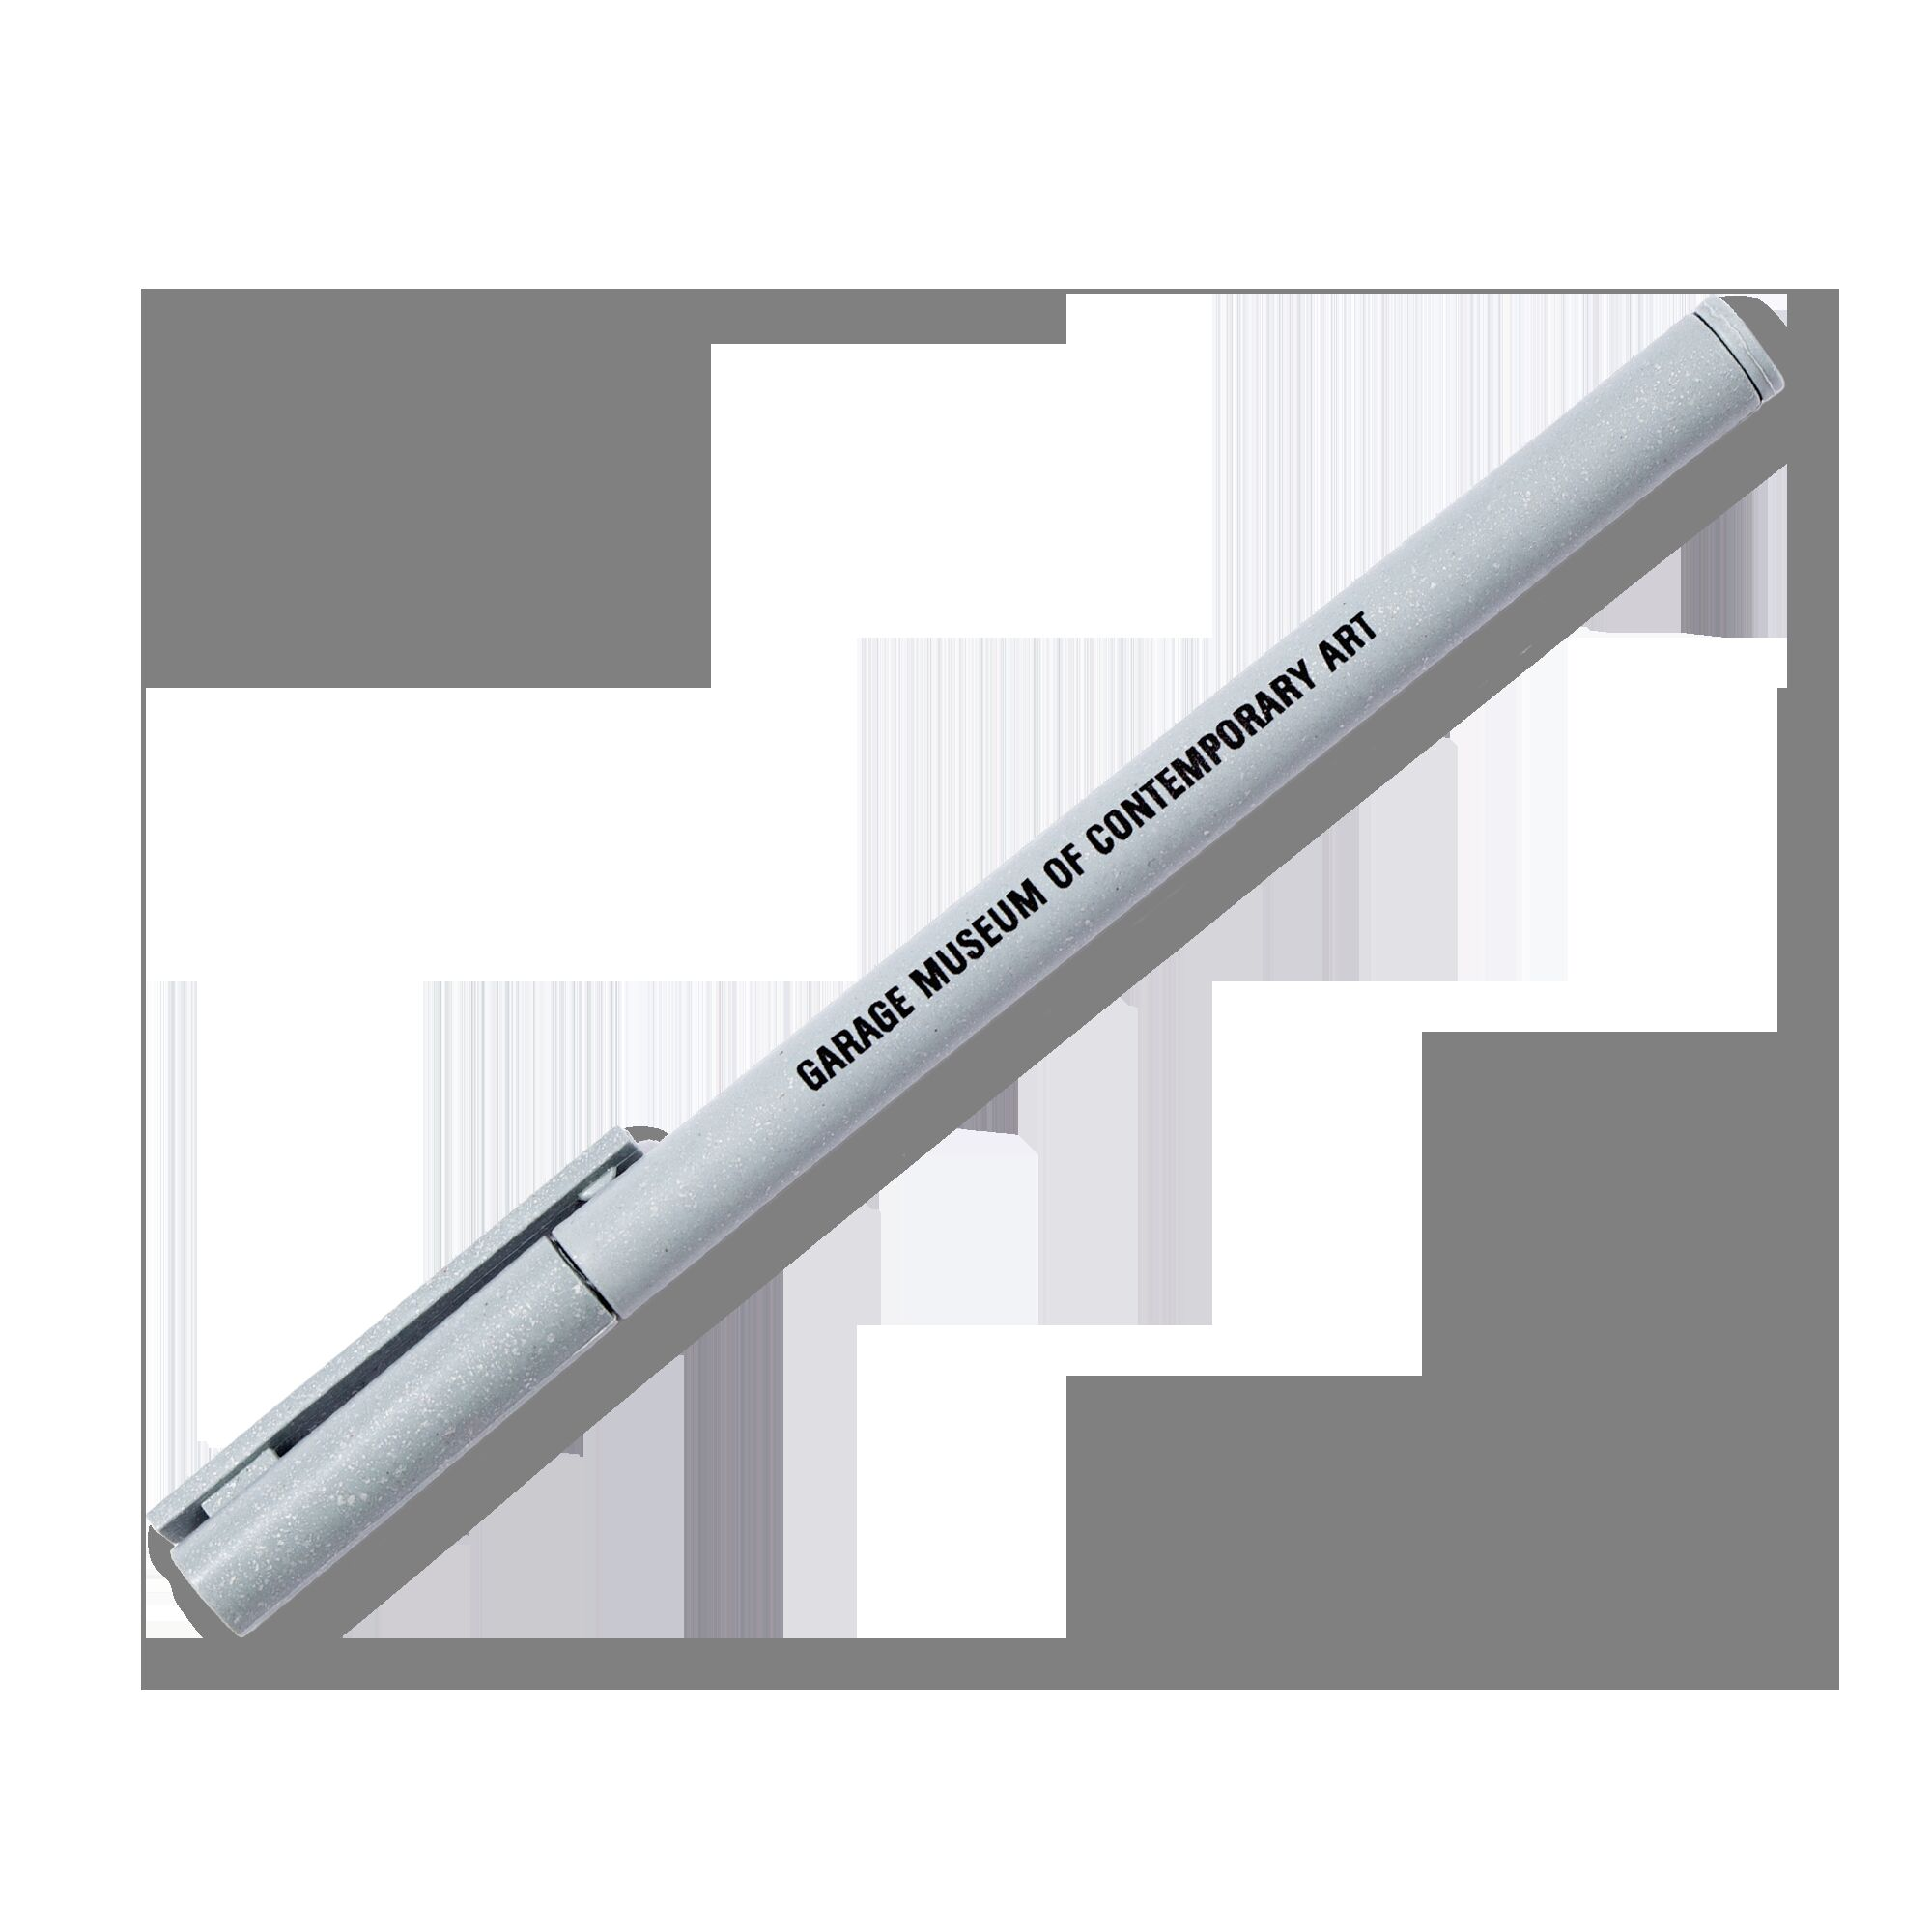 Tetra Pak pen, grey